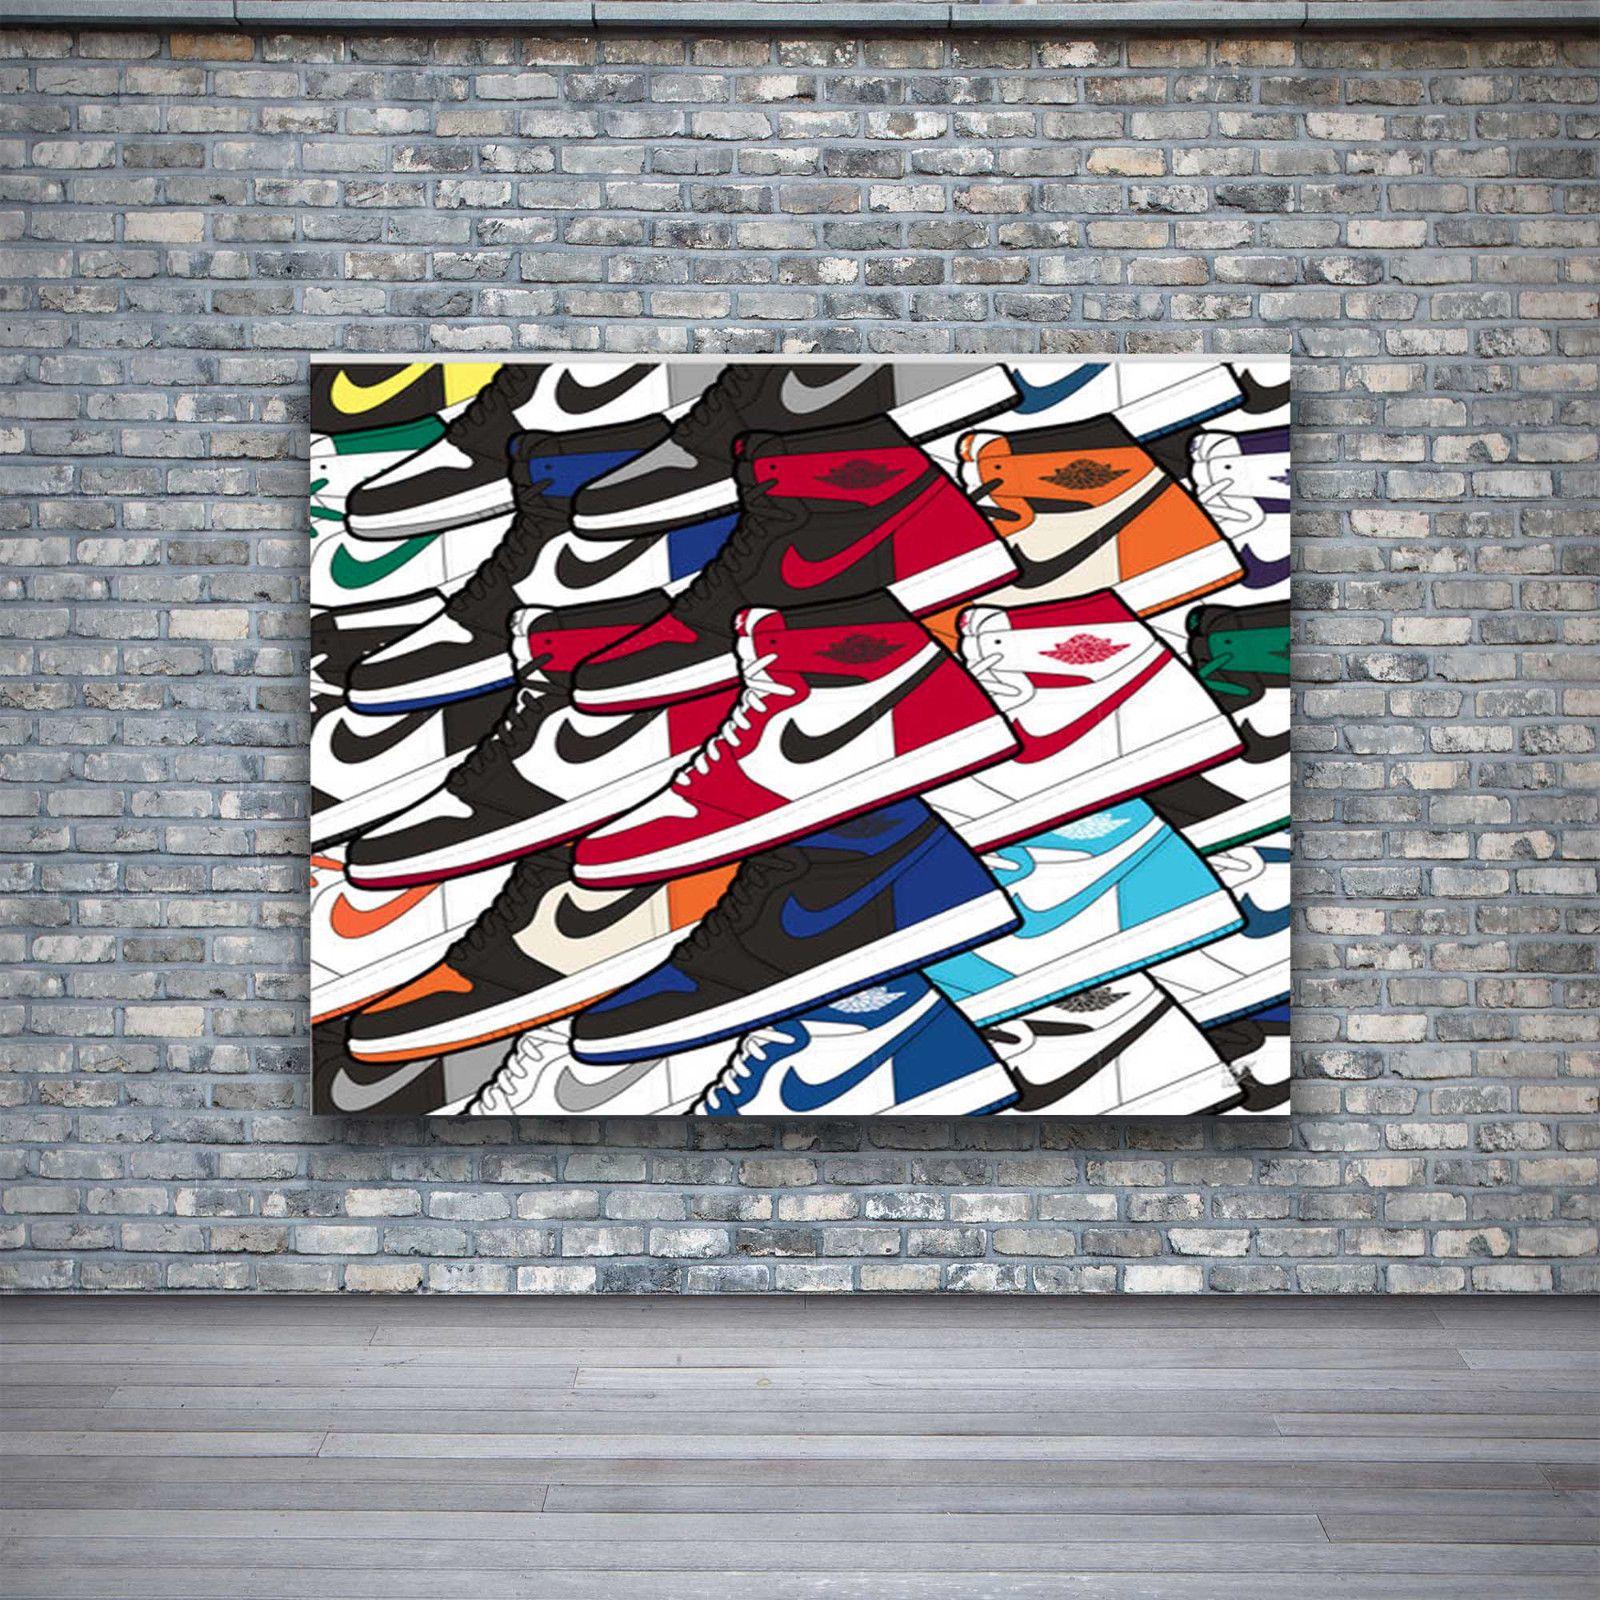 Air Jordan 1 Colorful Design Wall Art Canvas Print Poster 25 0 Canvas Art Prints Wall Art Canvas Prints Canvas Art